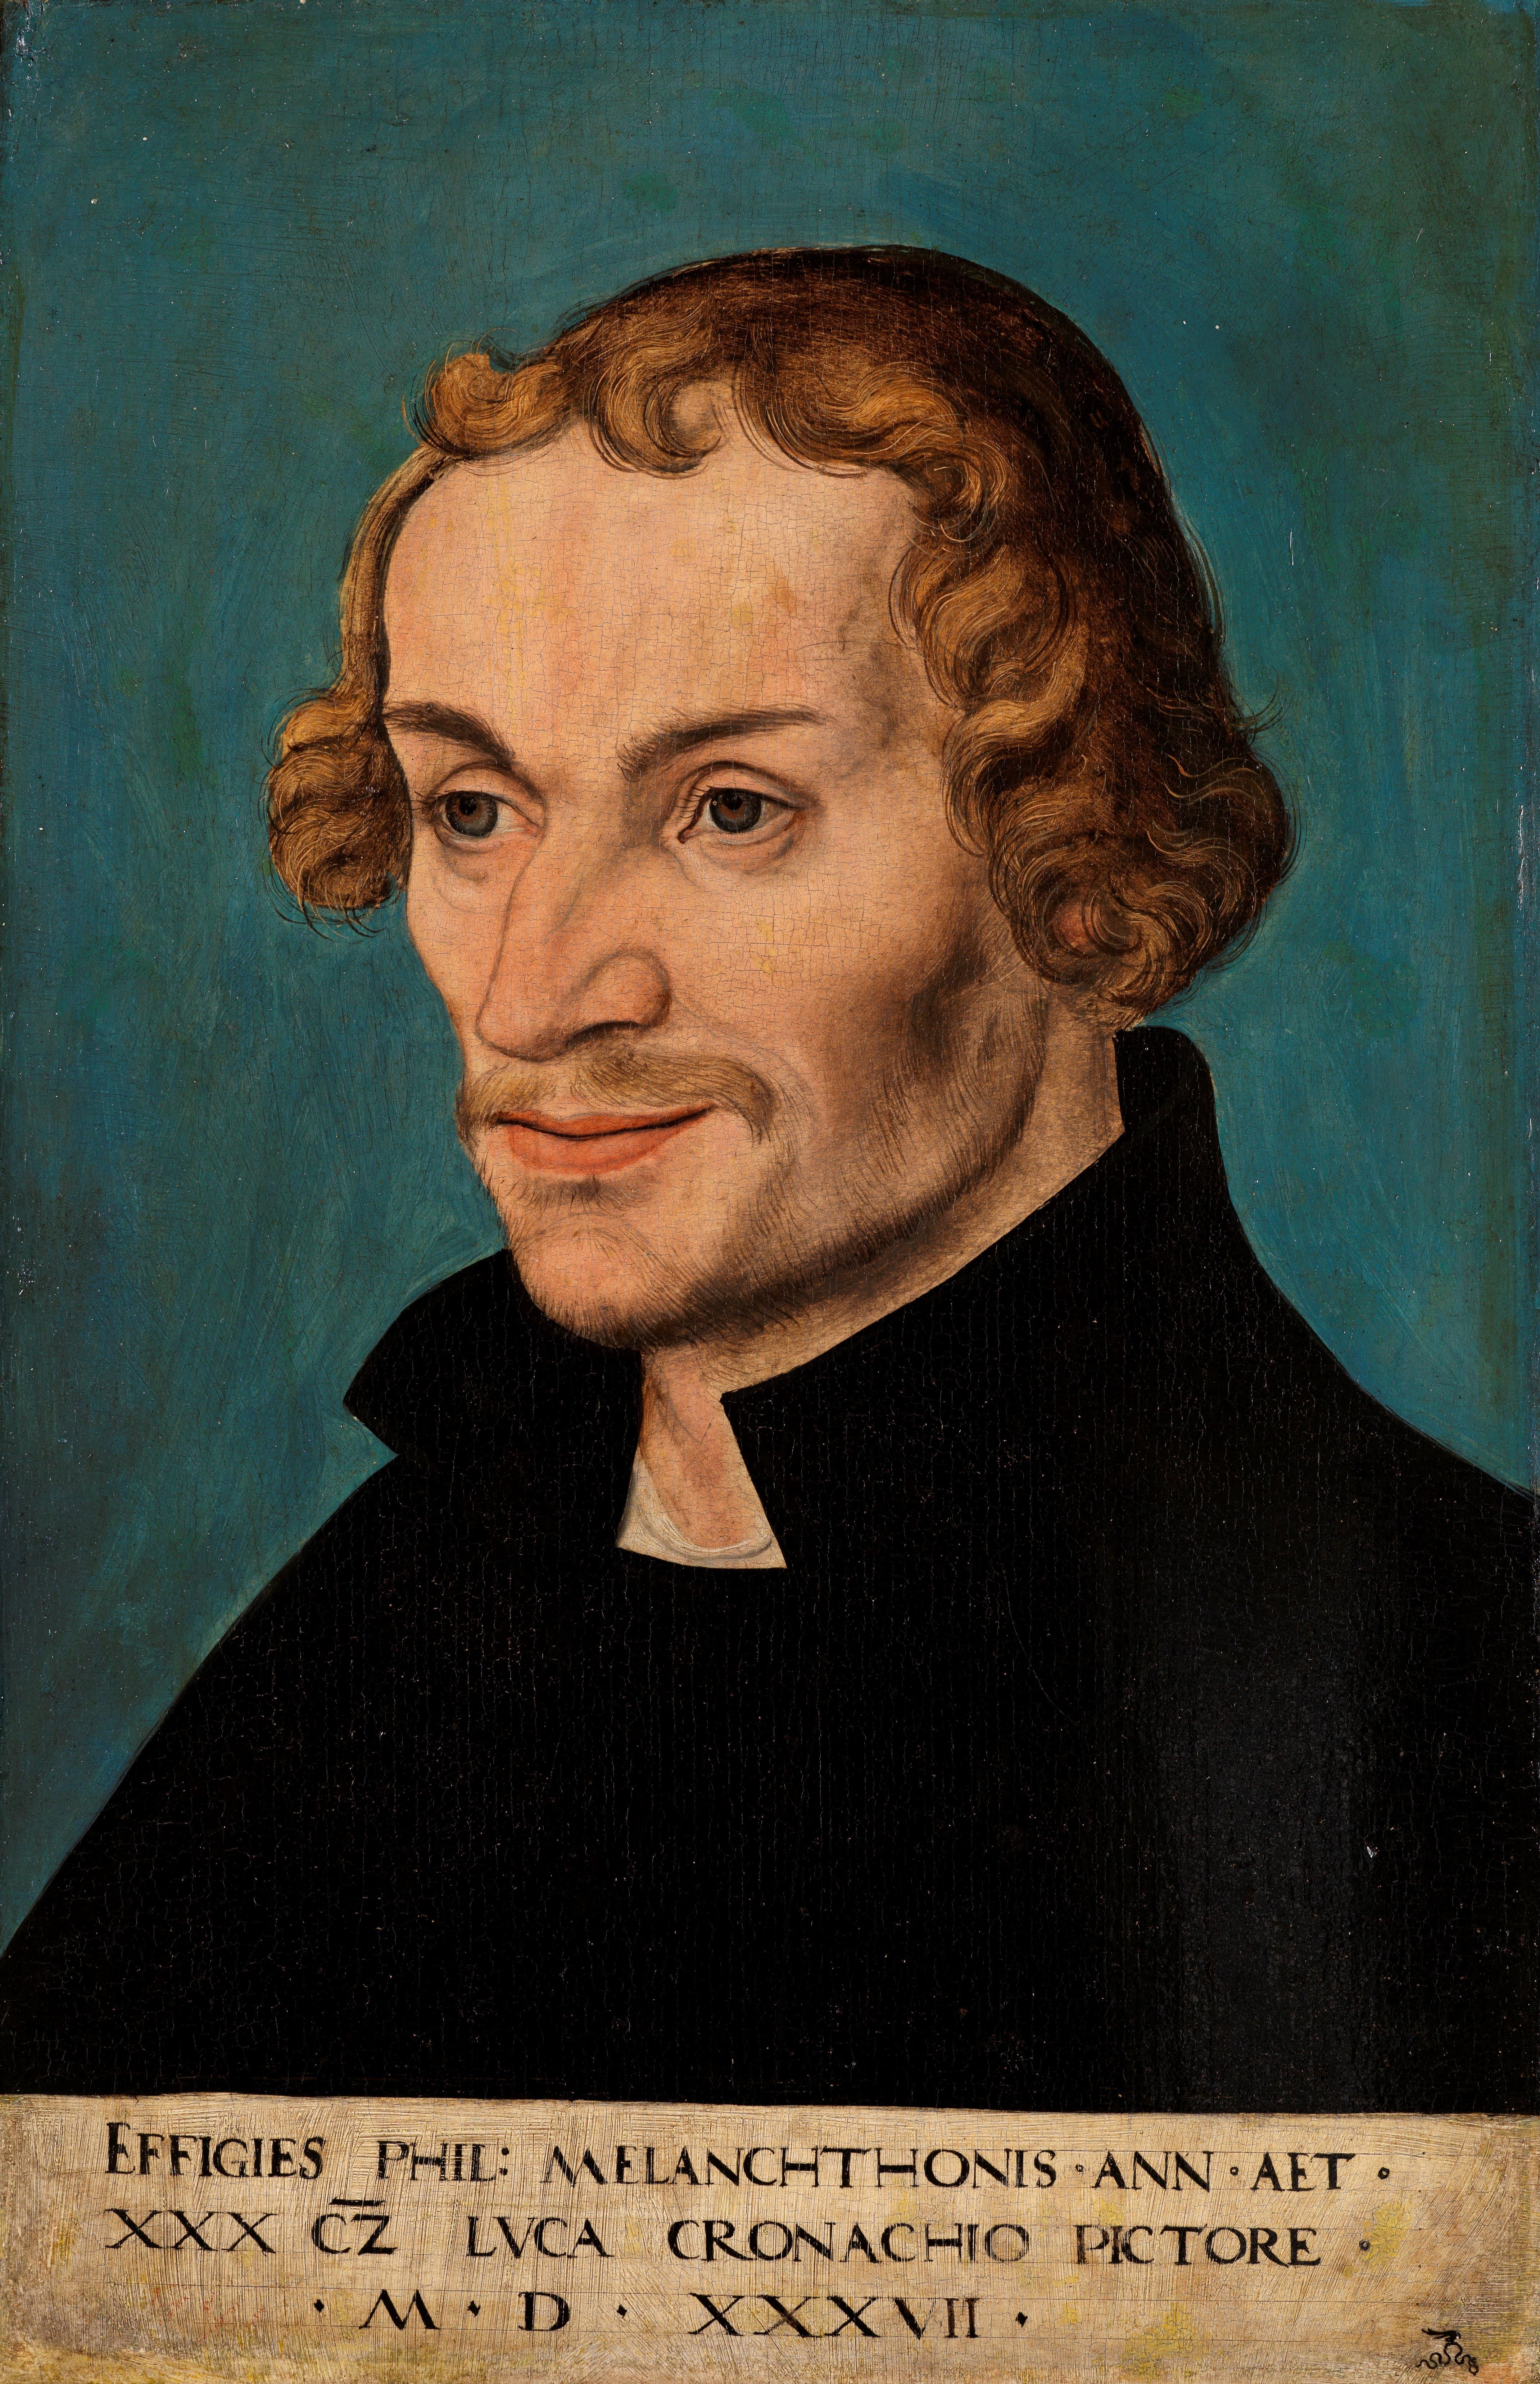 File:Philipp-Melanchthon-1537.jpg